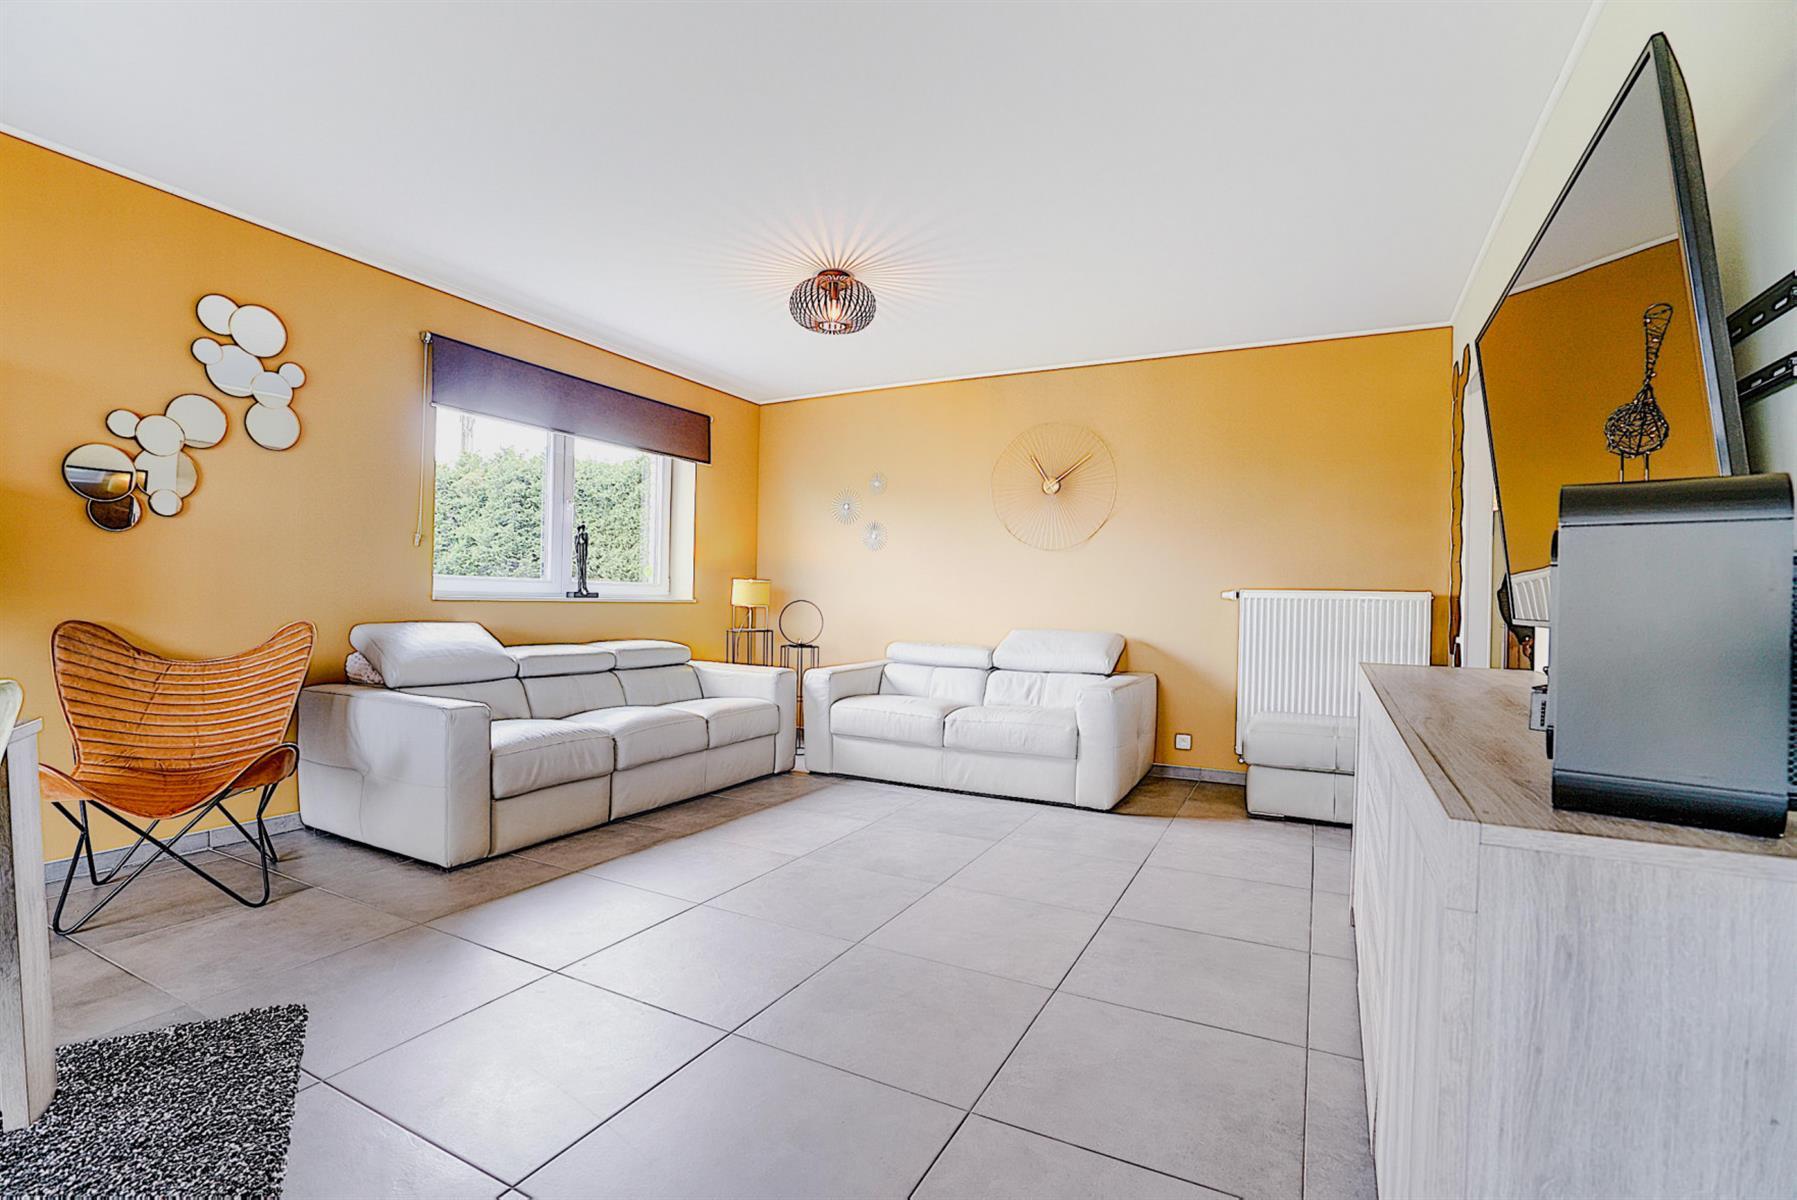 Appartement - Grâce-hollogne - #4364483-5